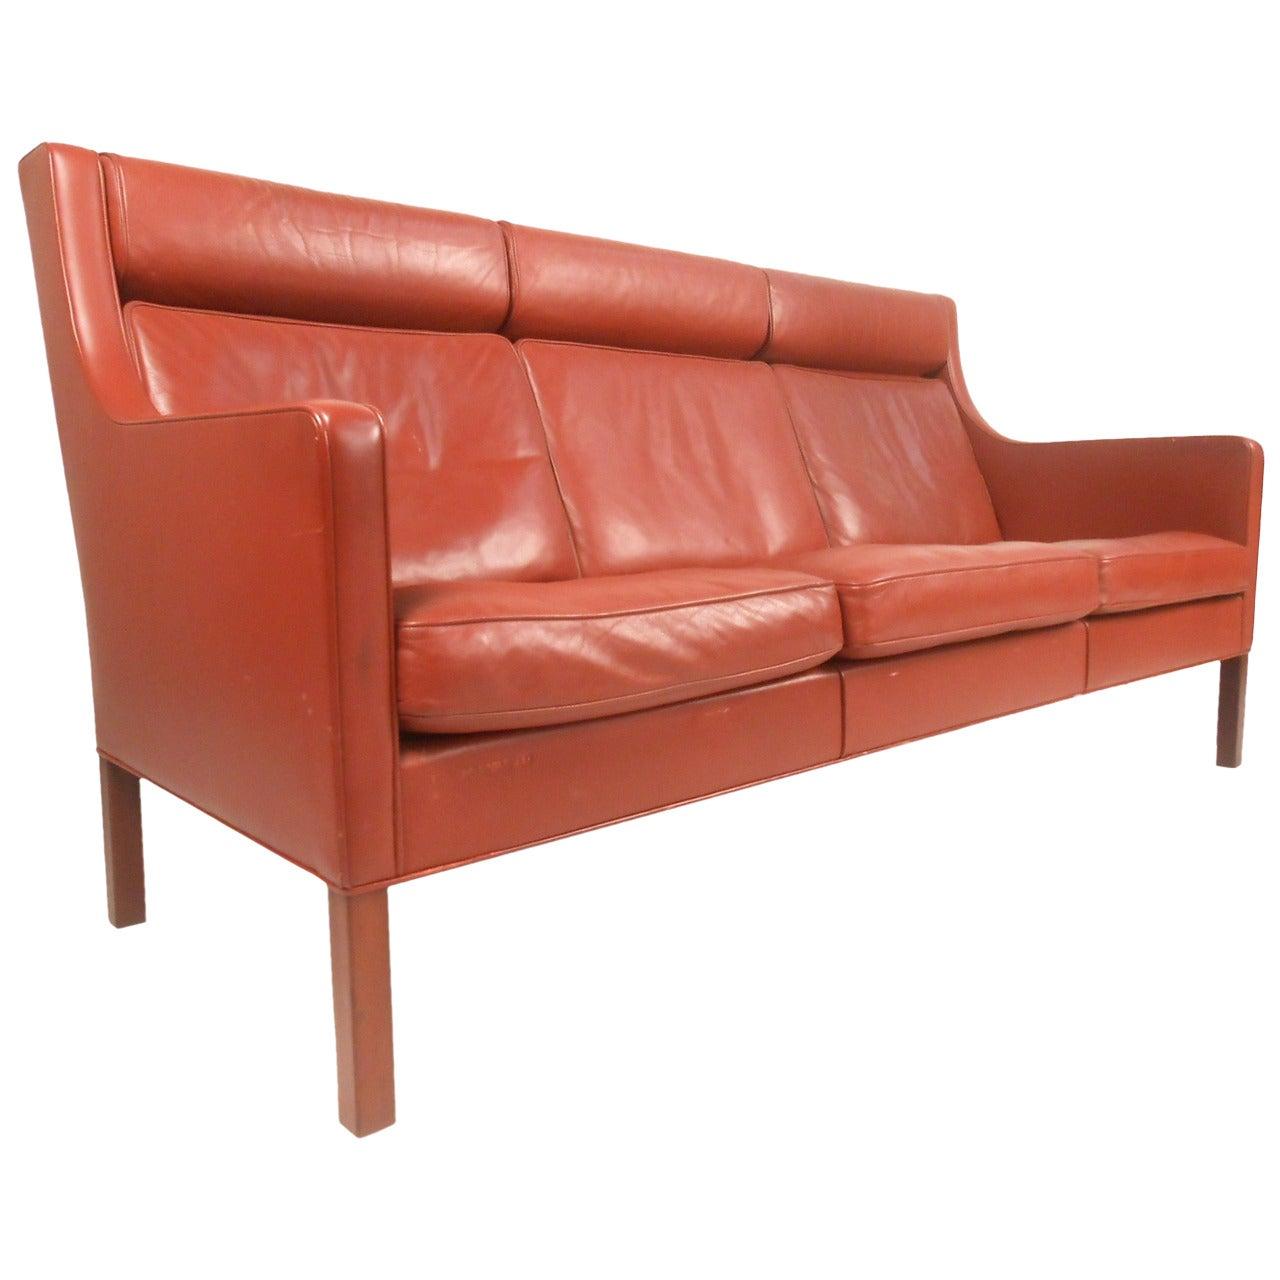 Børge Mogensen Leather Sofa